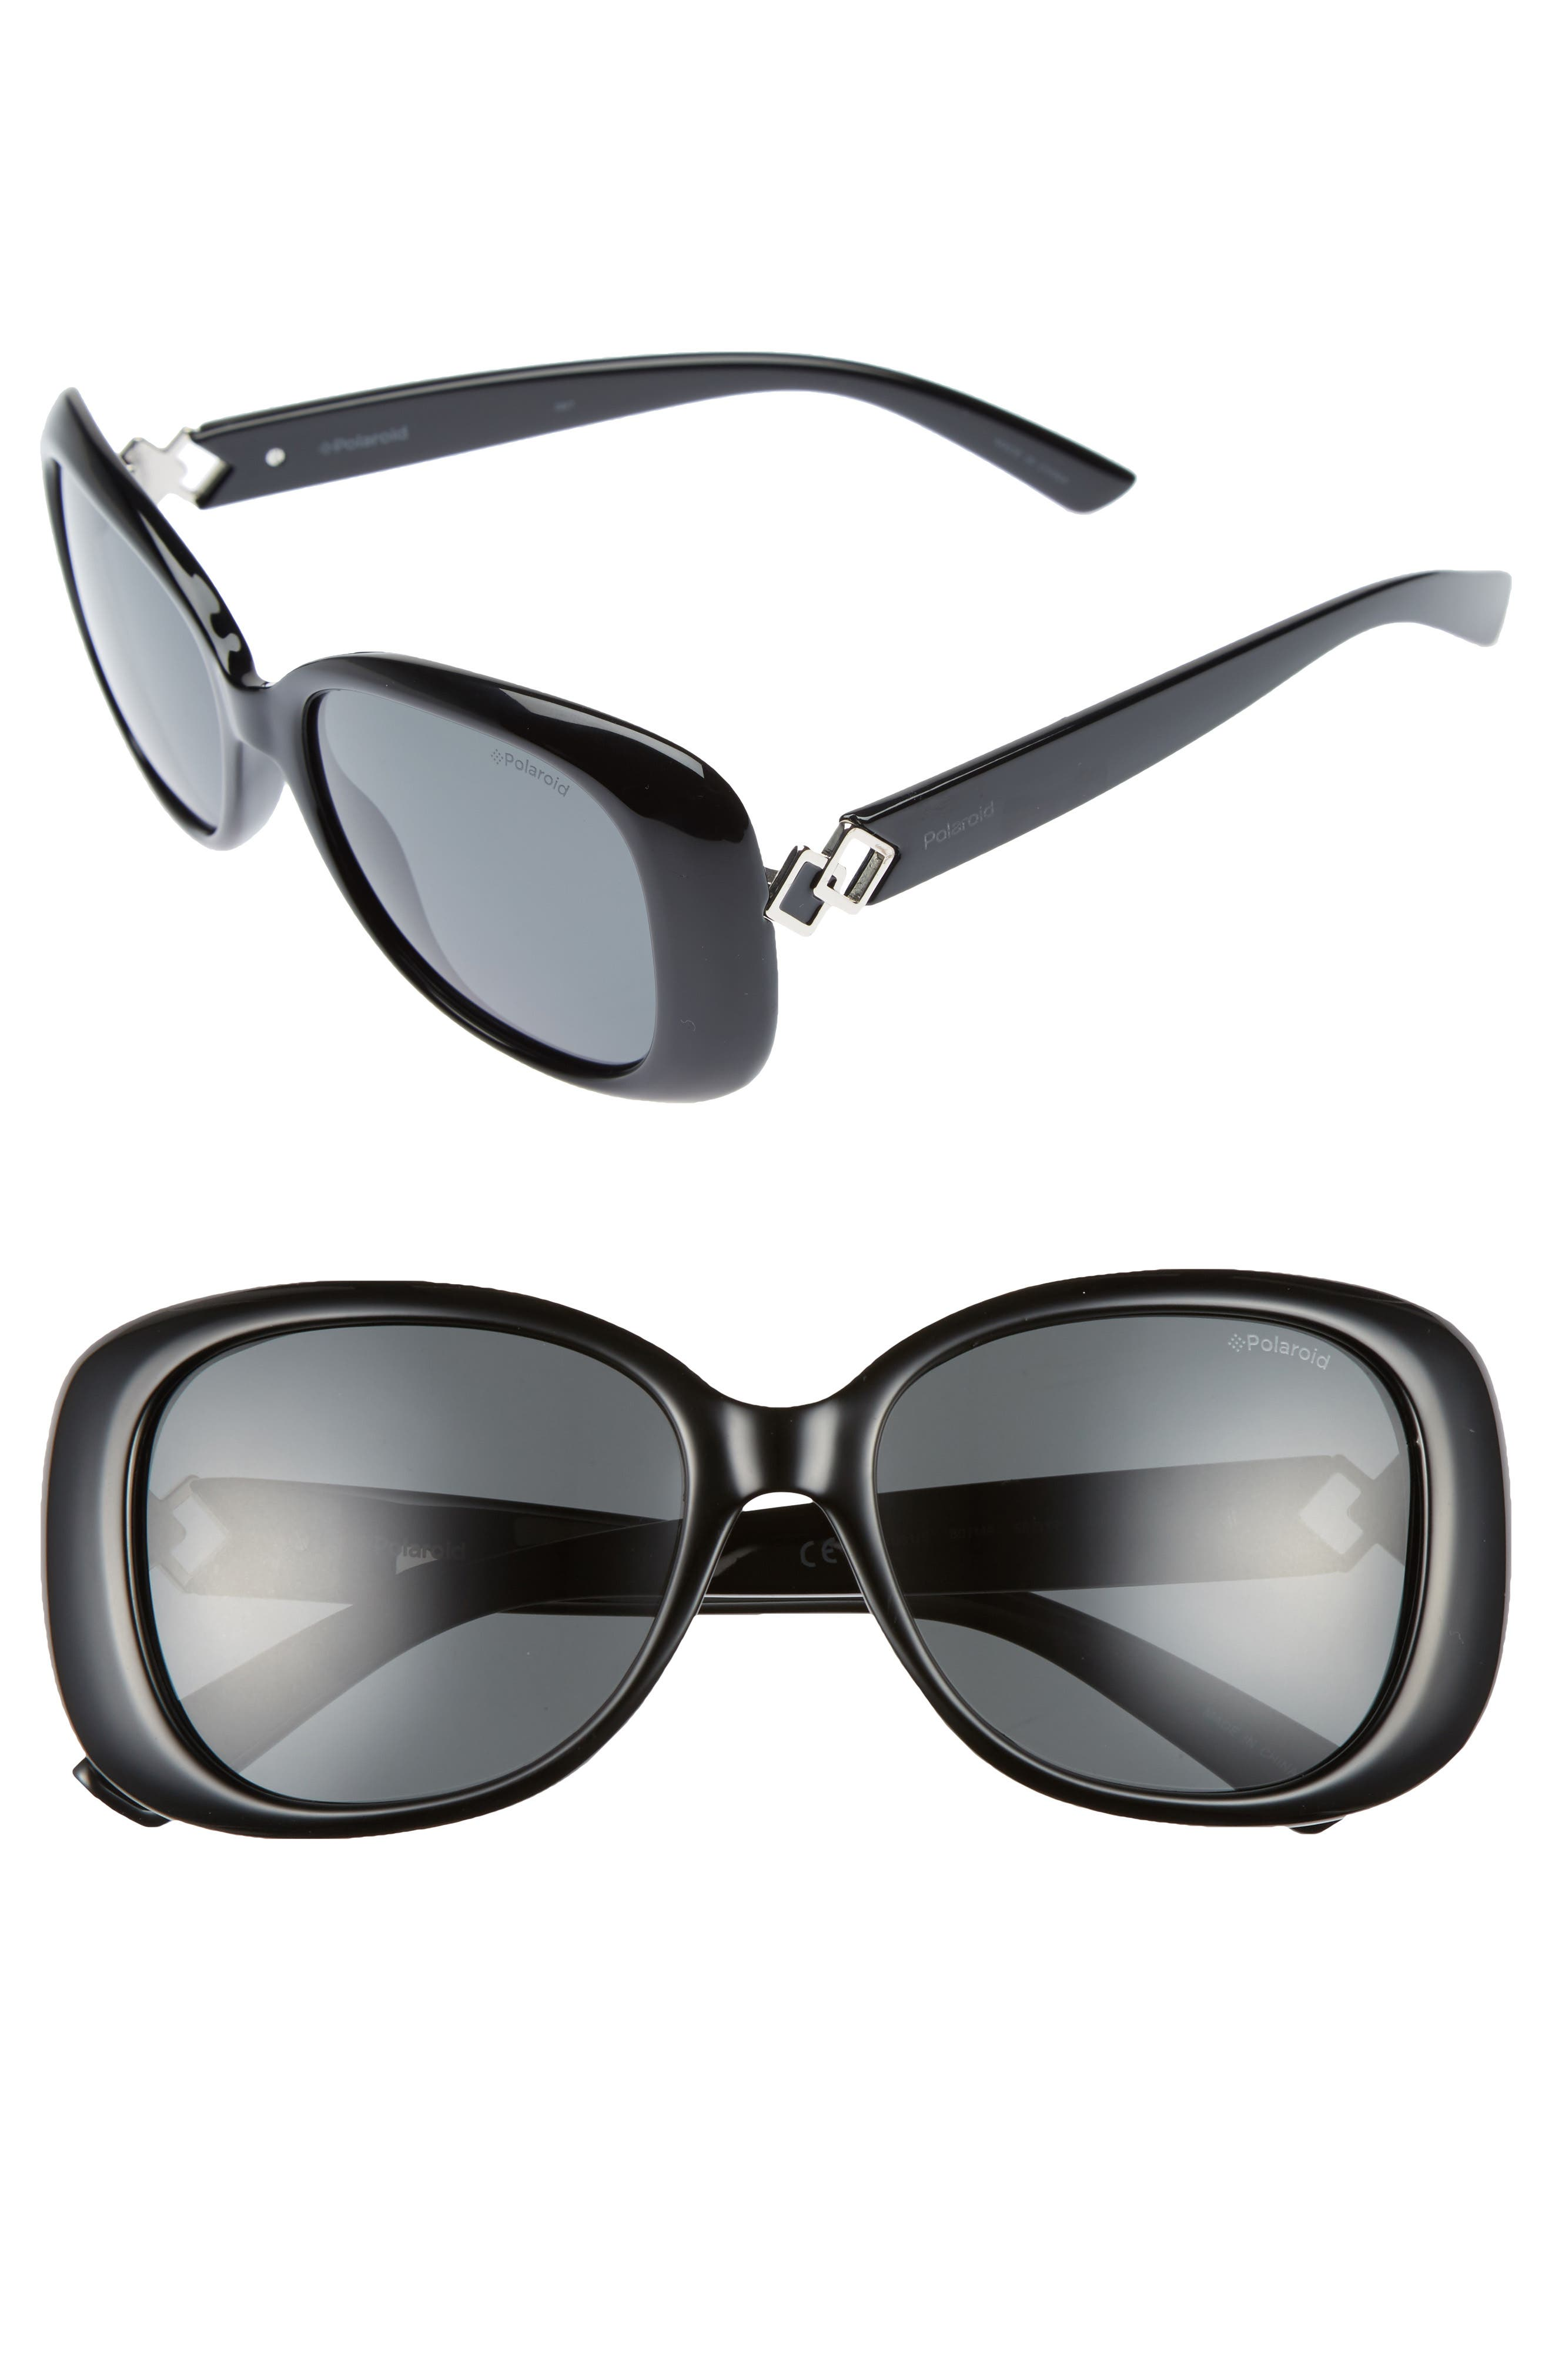 POLAROID 55mm Polarized Butterfly Sunglasses